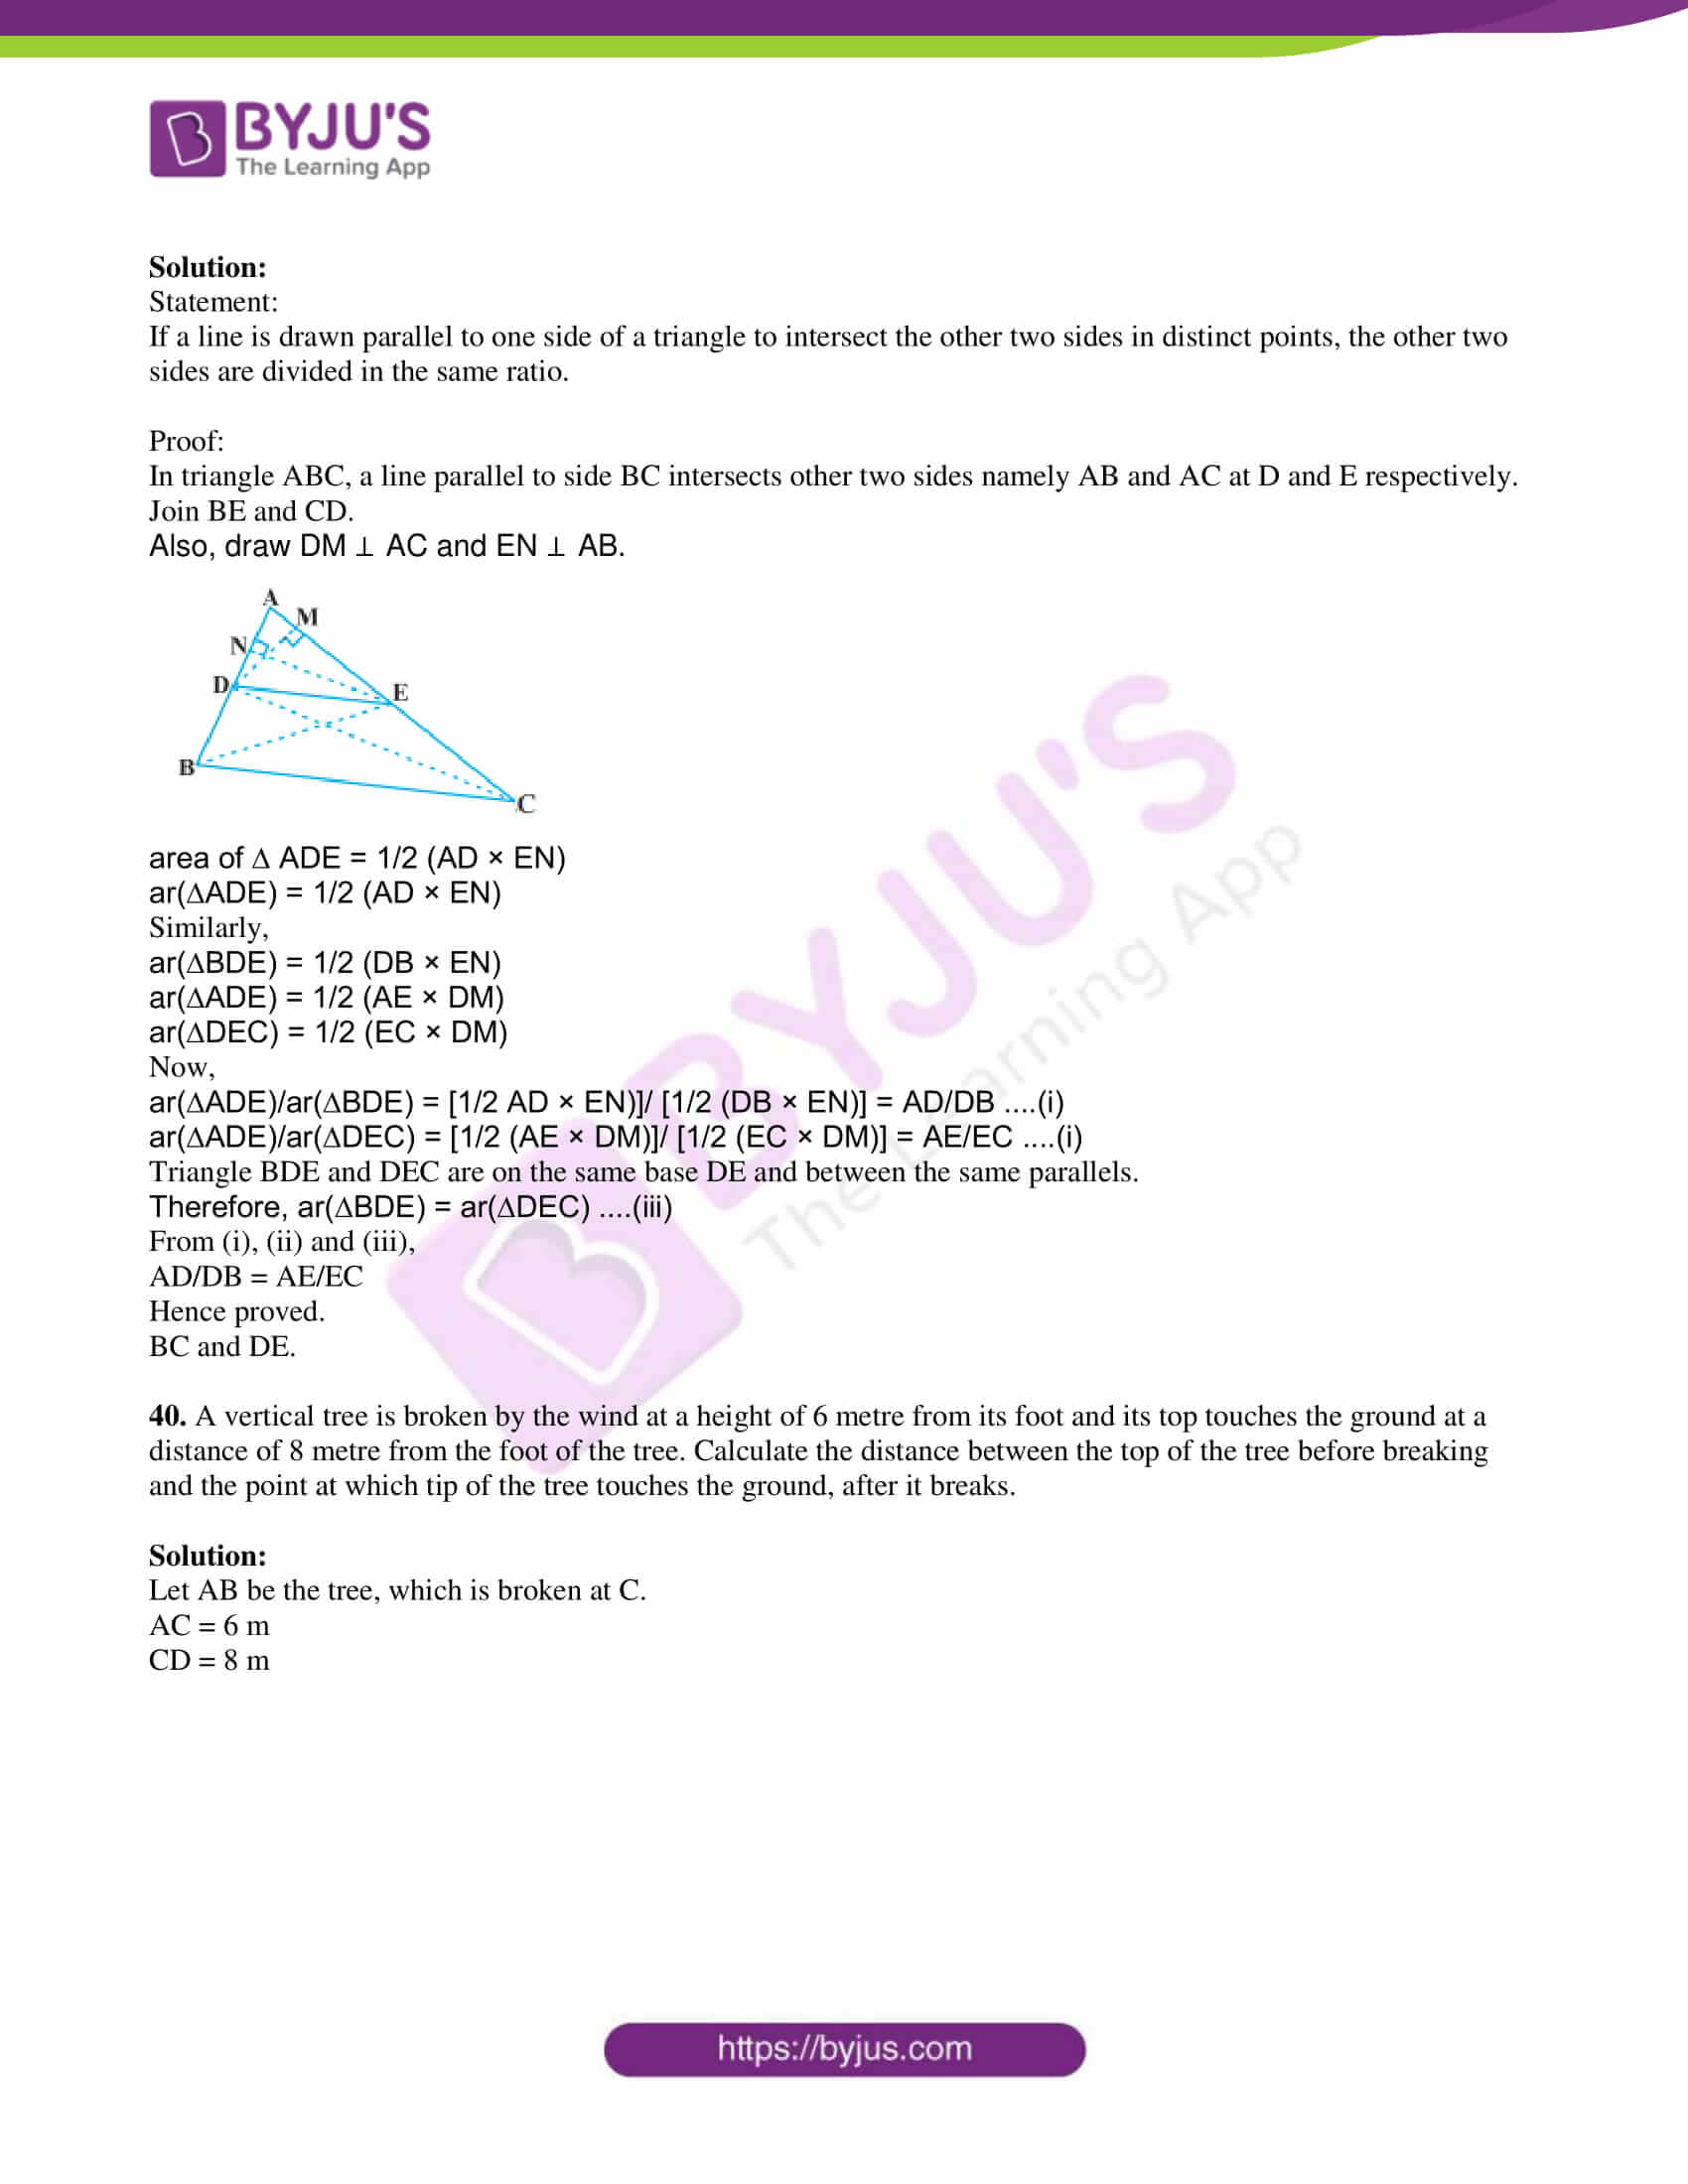 kseeb class 10 maths question paper solution 2018 21